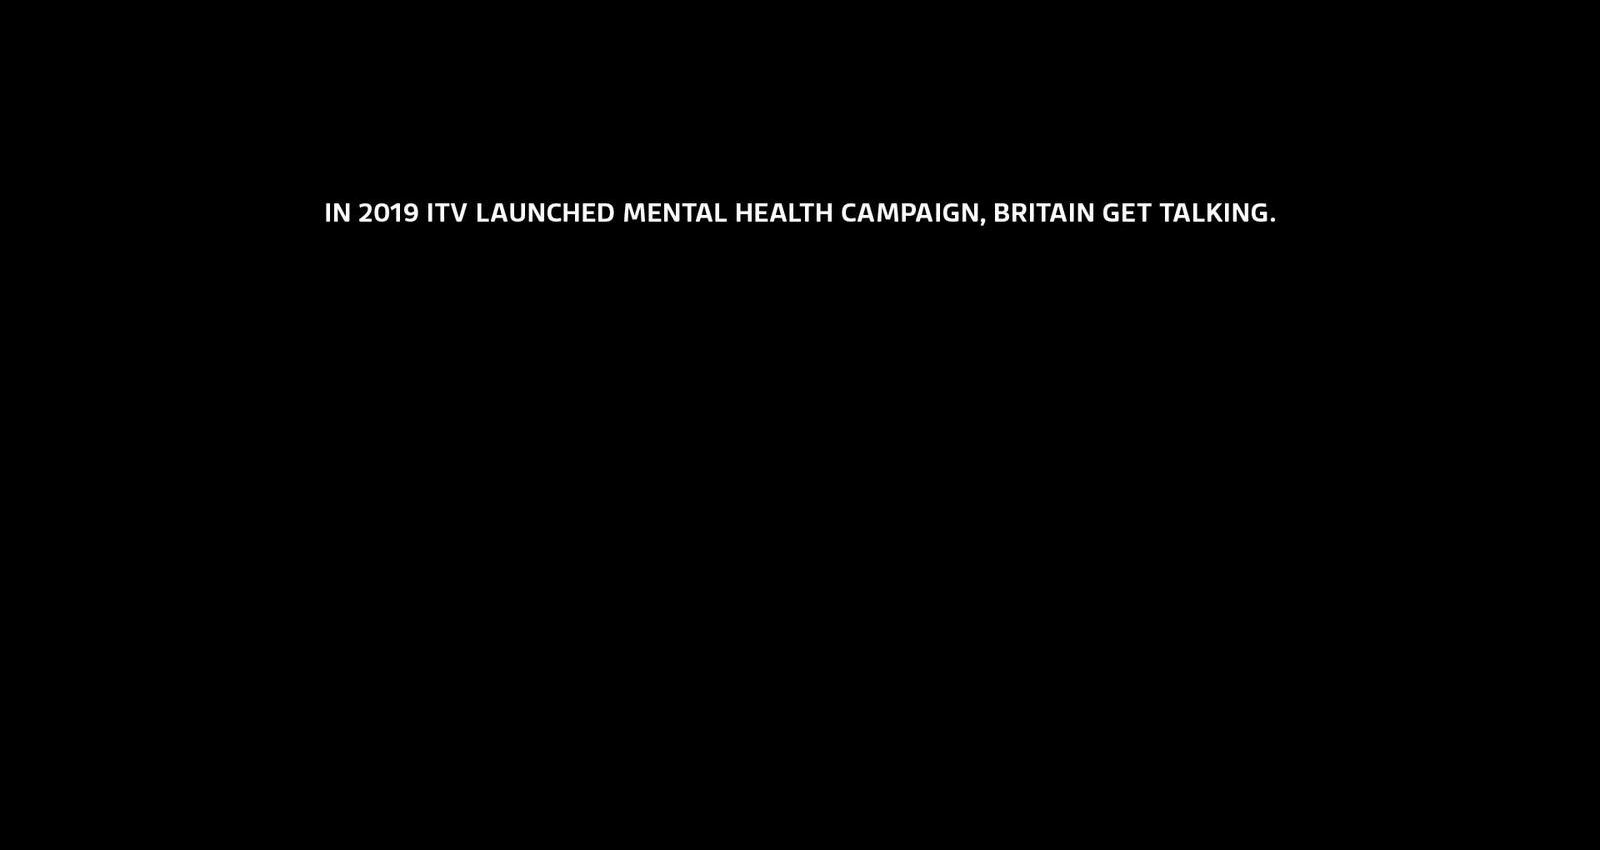 Britain Get Talking Covid-19